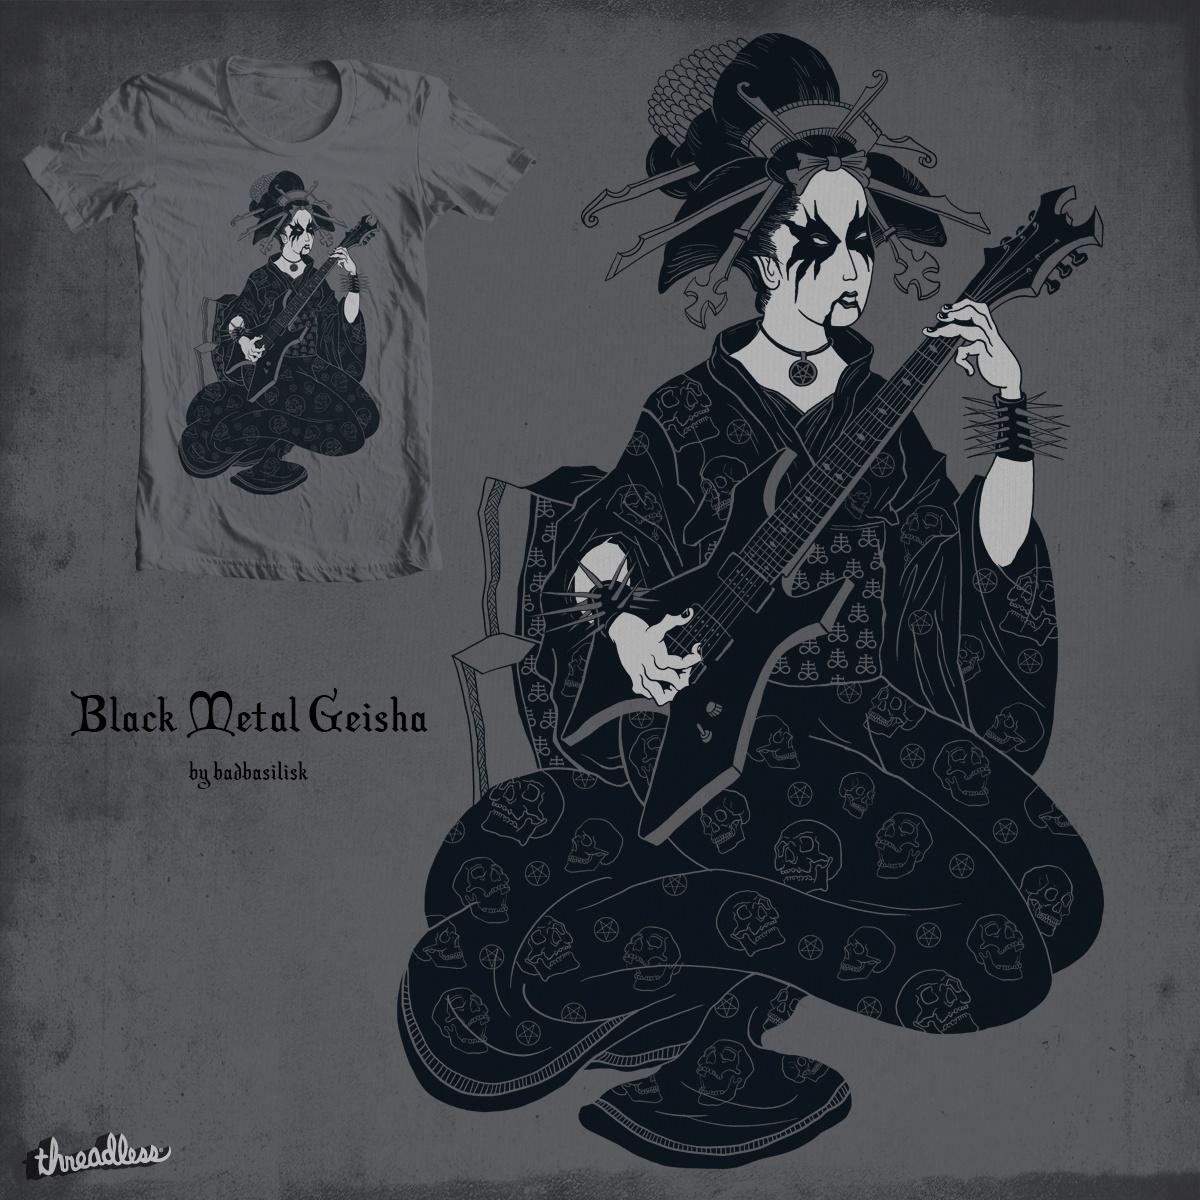 Black Metal Geisha by badbasilisk on Threadless